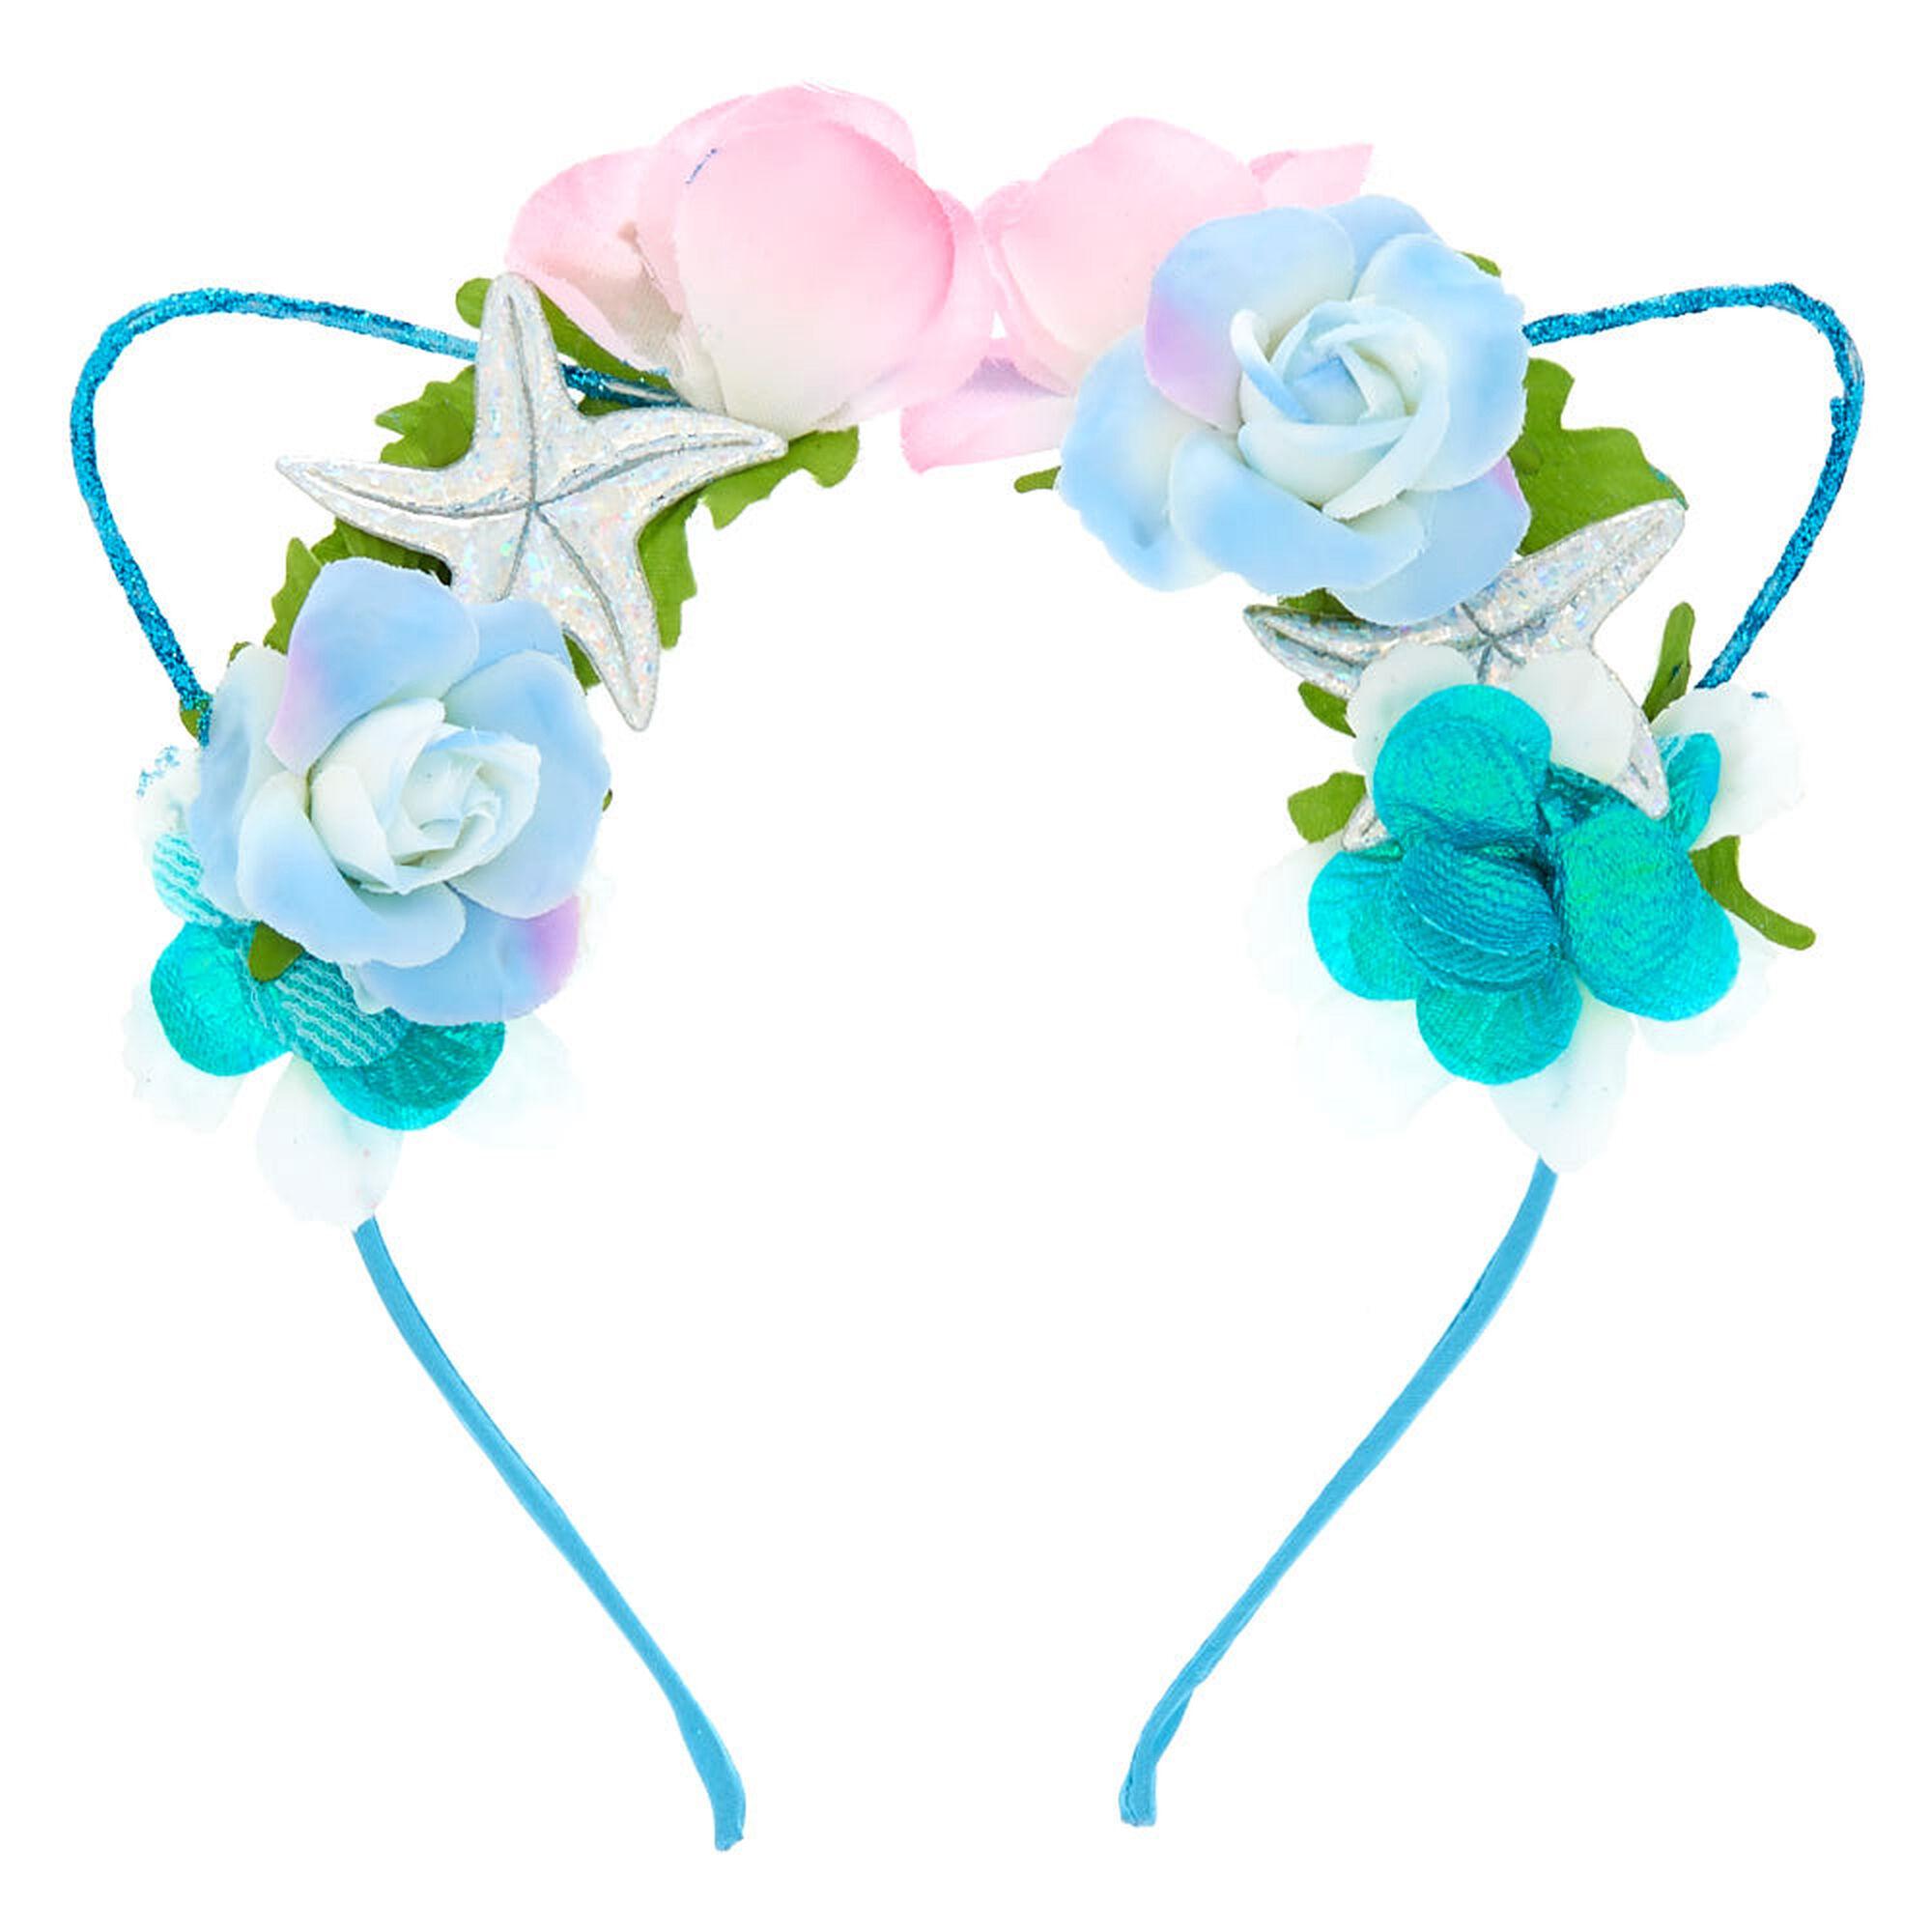 Holographic Mermaid Cat Ears Flower Crown Headband Icing Us